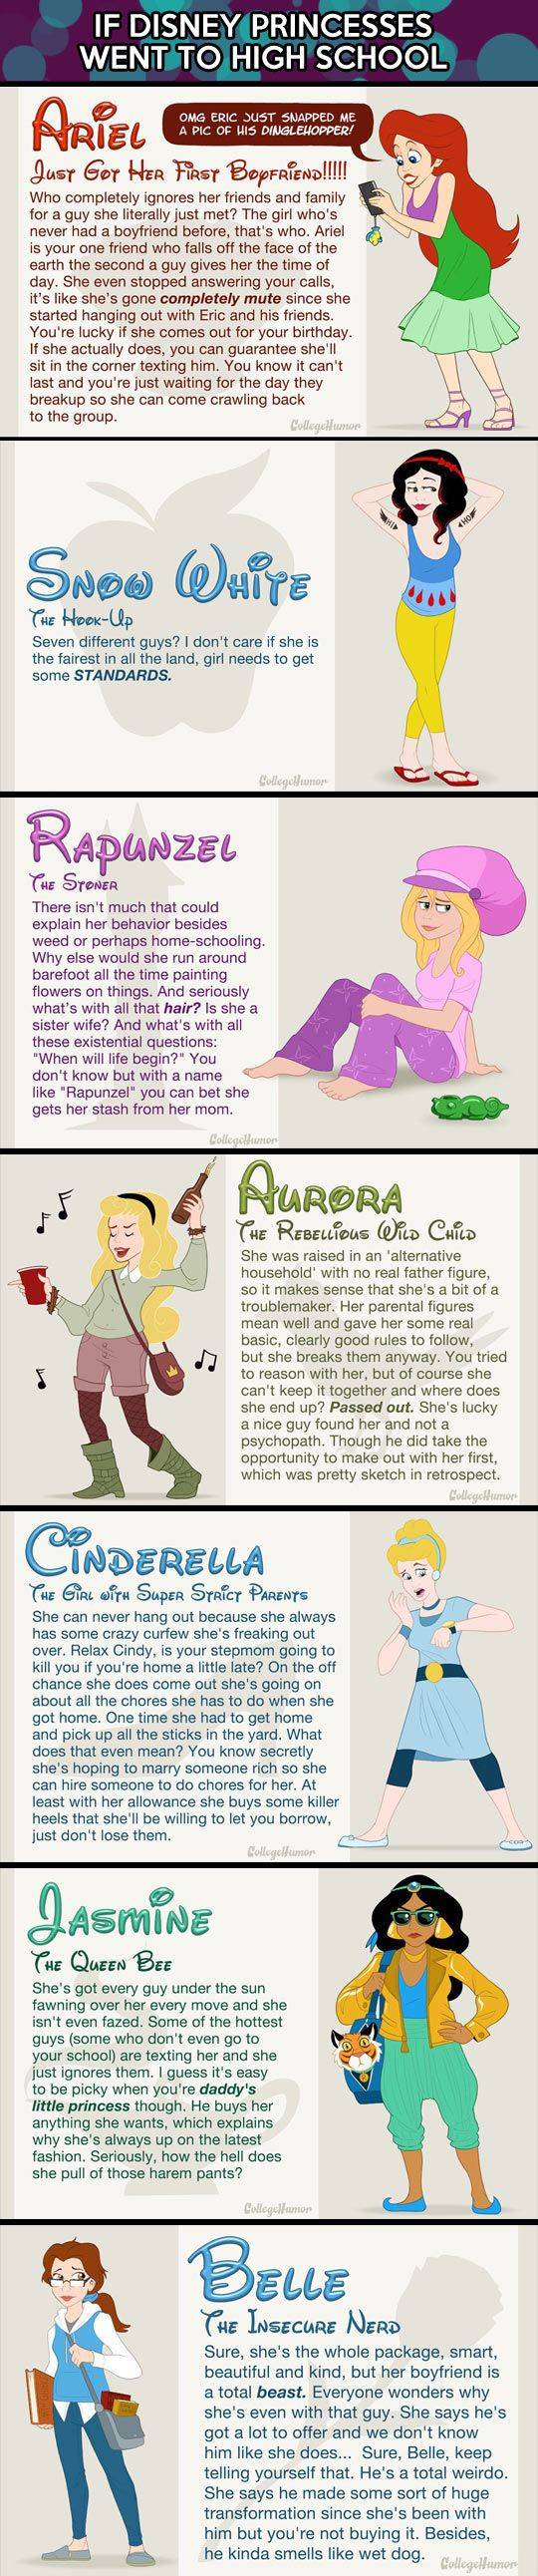 If Disney Princesses went to high school… Oh my gosh.